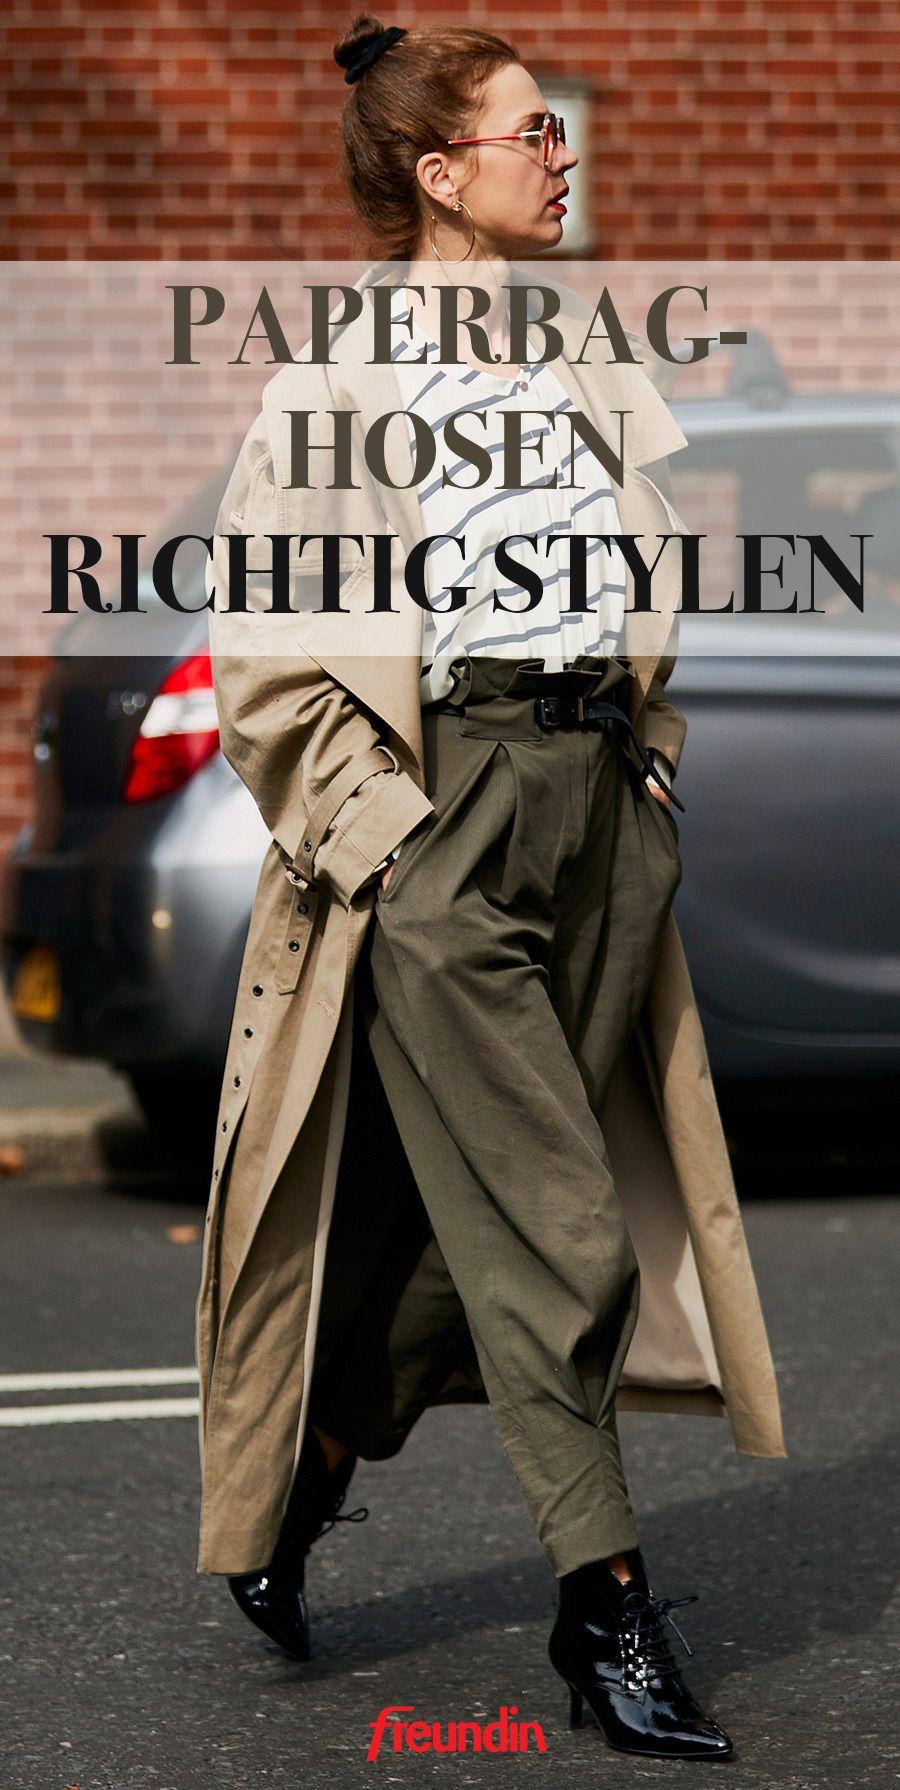 9be3269a1df5 Darum braucht jede Frau eine Paperbag-Hose   Fashion   Fashion ...